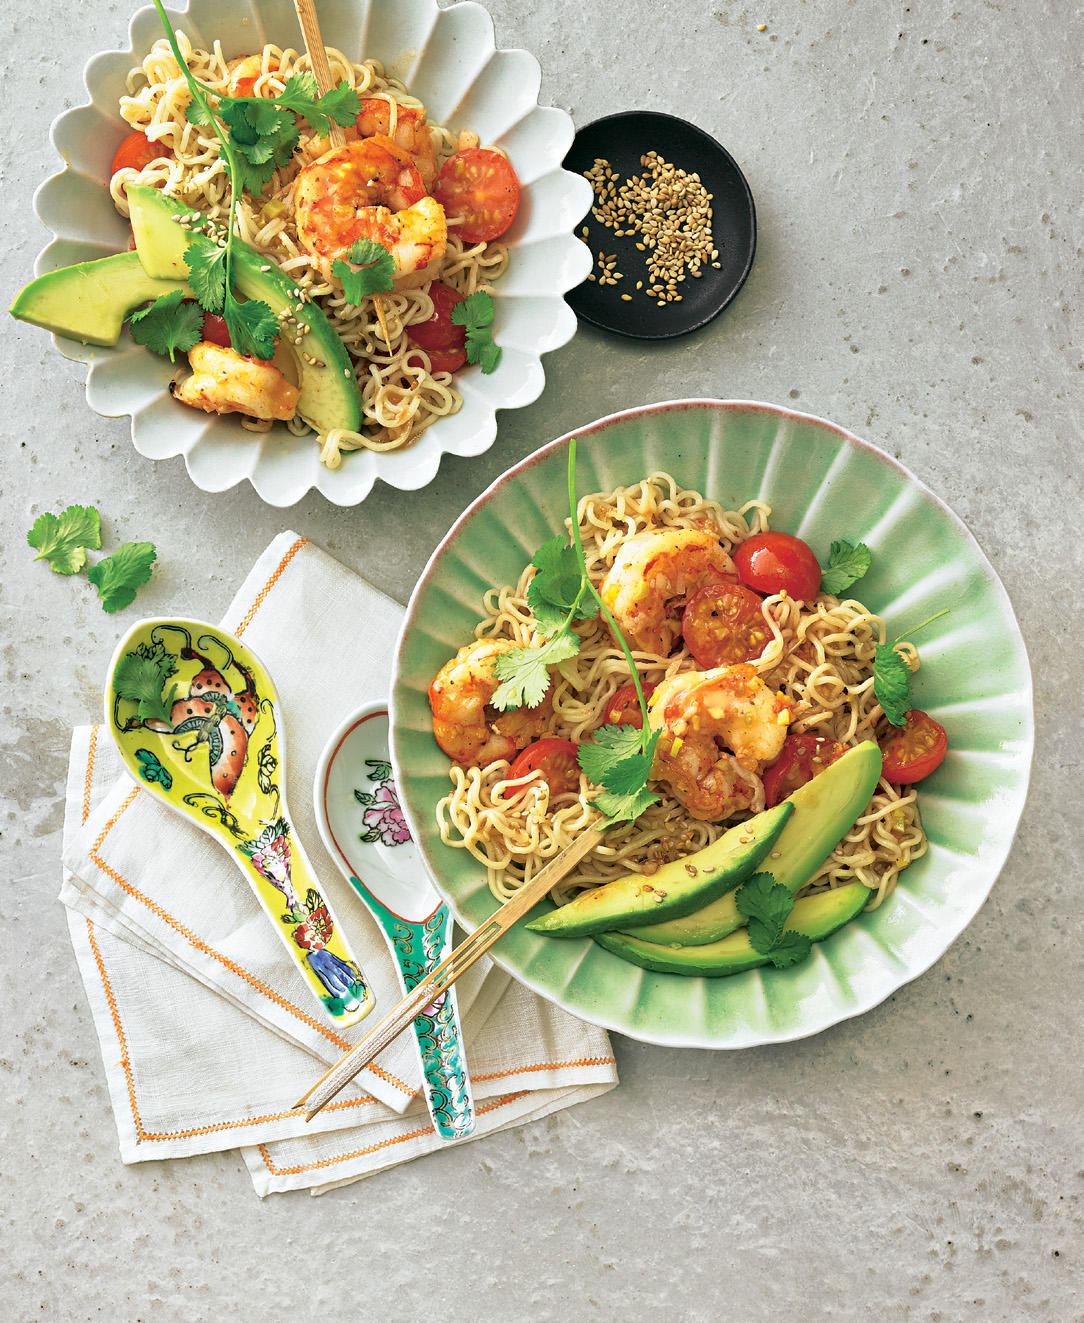 Asiatische Küche: Die besten Rezepte | BRIGITTE.de